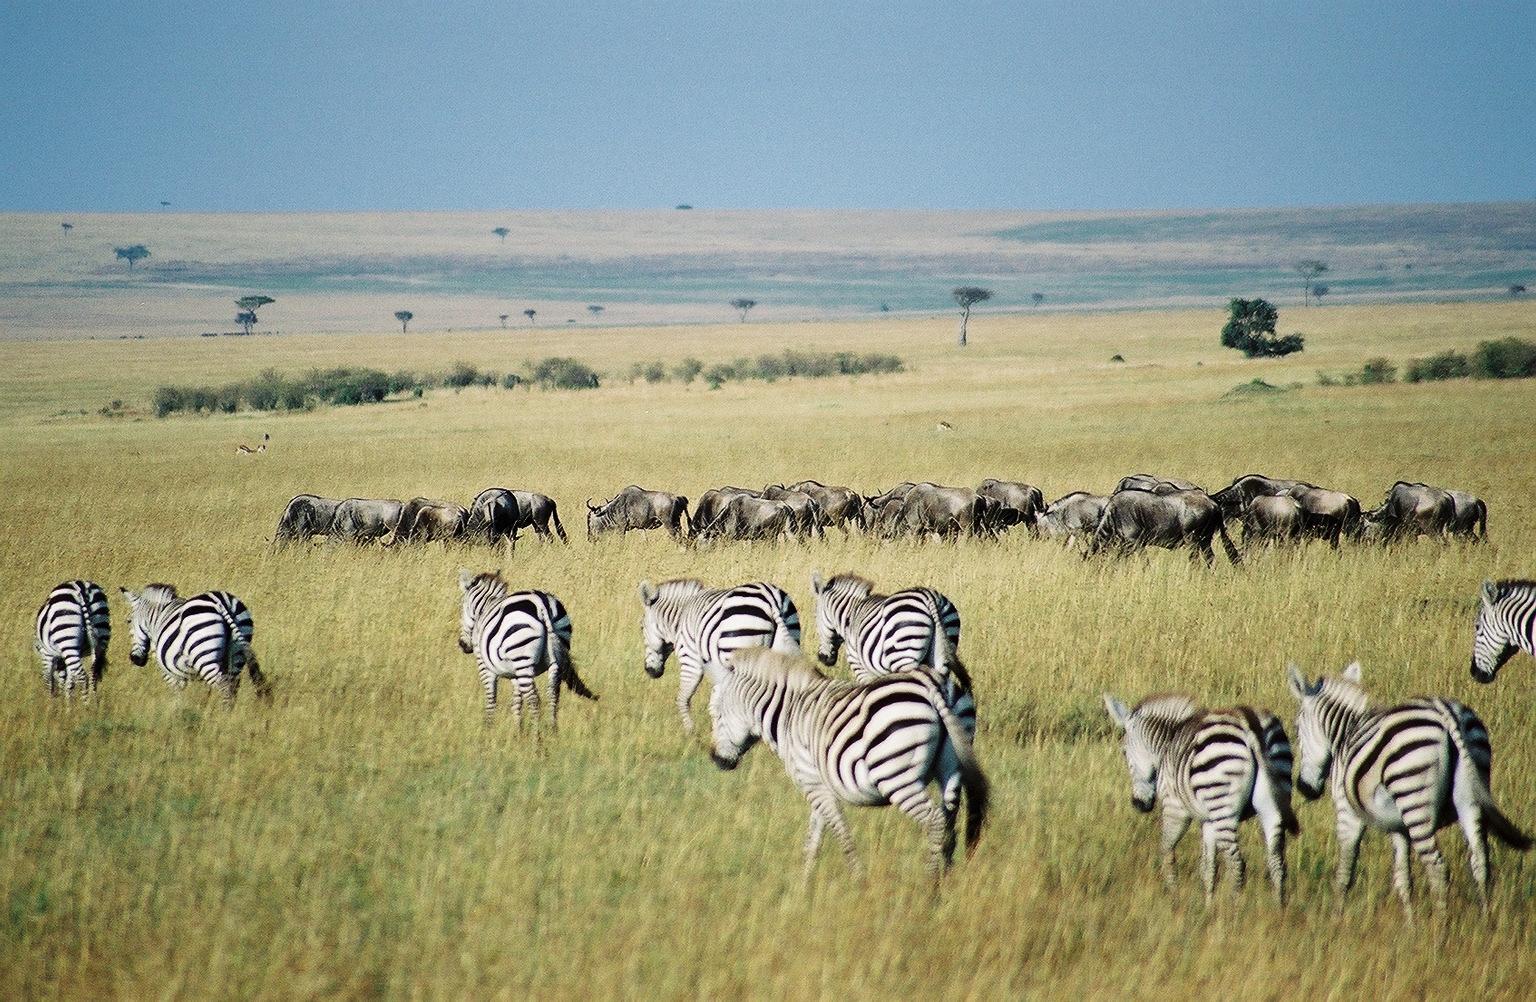 photography-destinations-Maasai-Mara-National-Reserve-Kenya